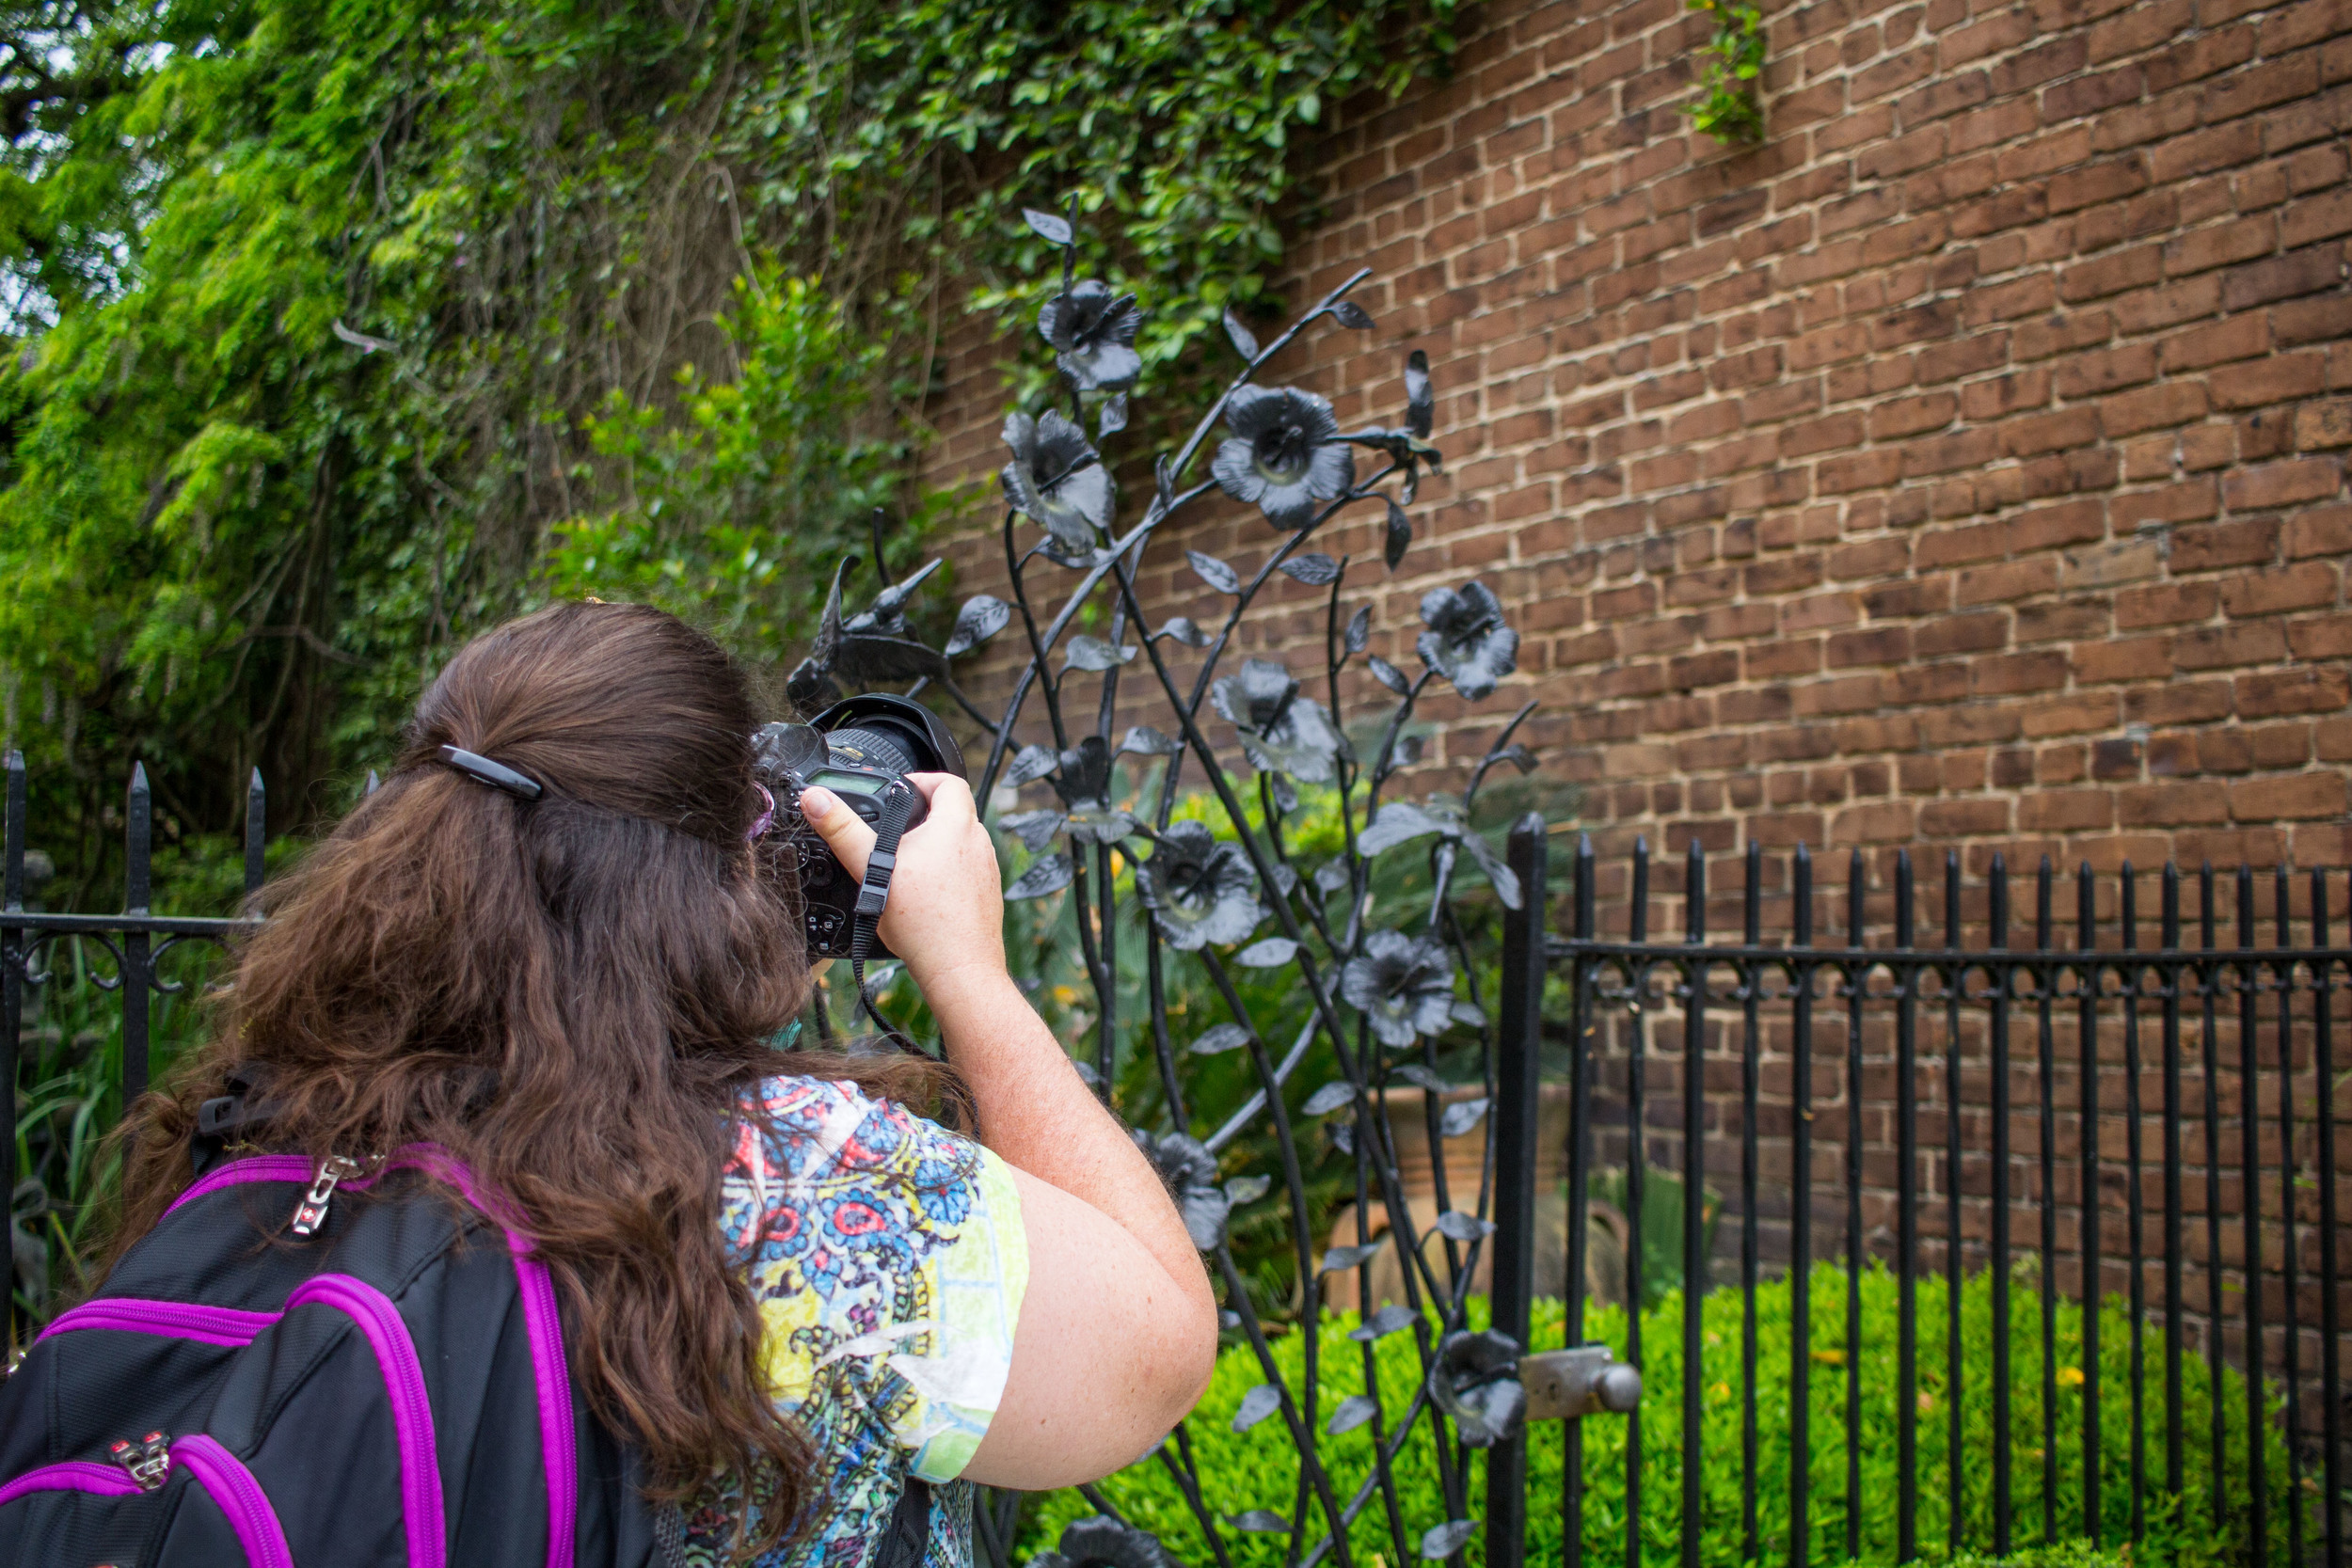 ®2015CapturingSavannah-PhotographyTours-UsWithClients_2.09.jpg